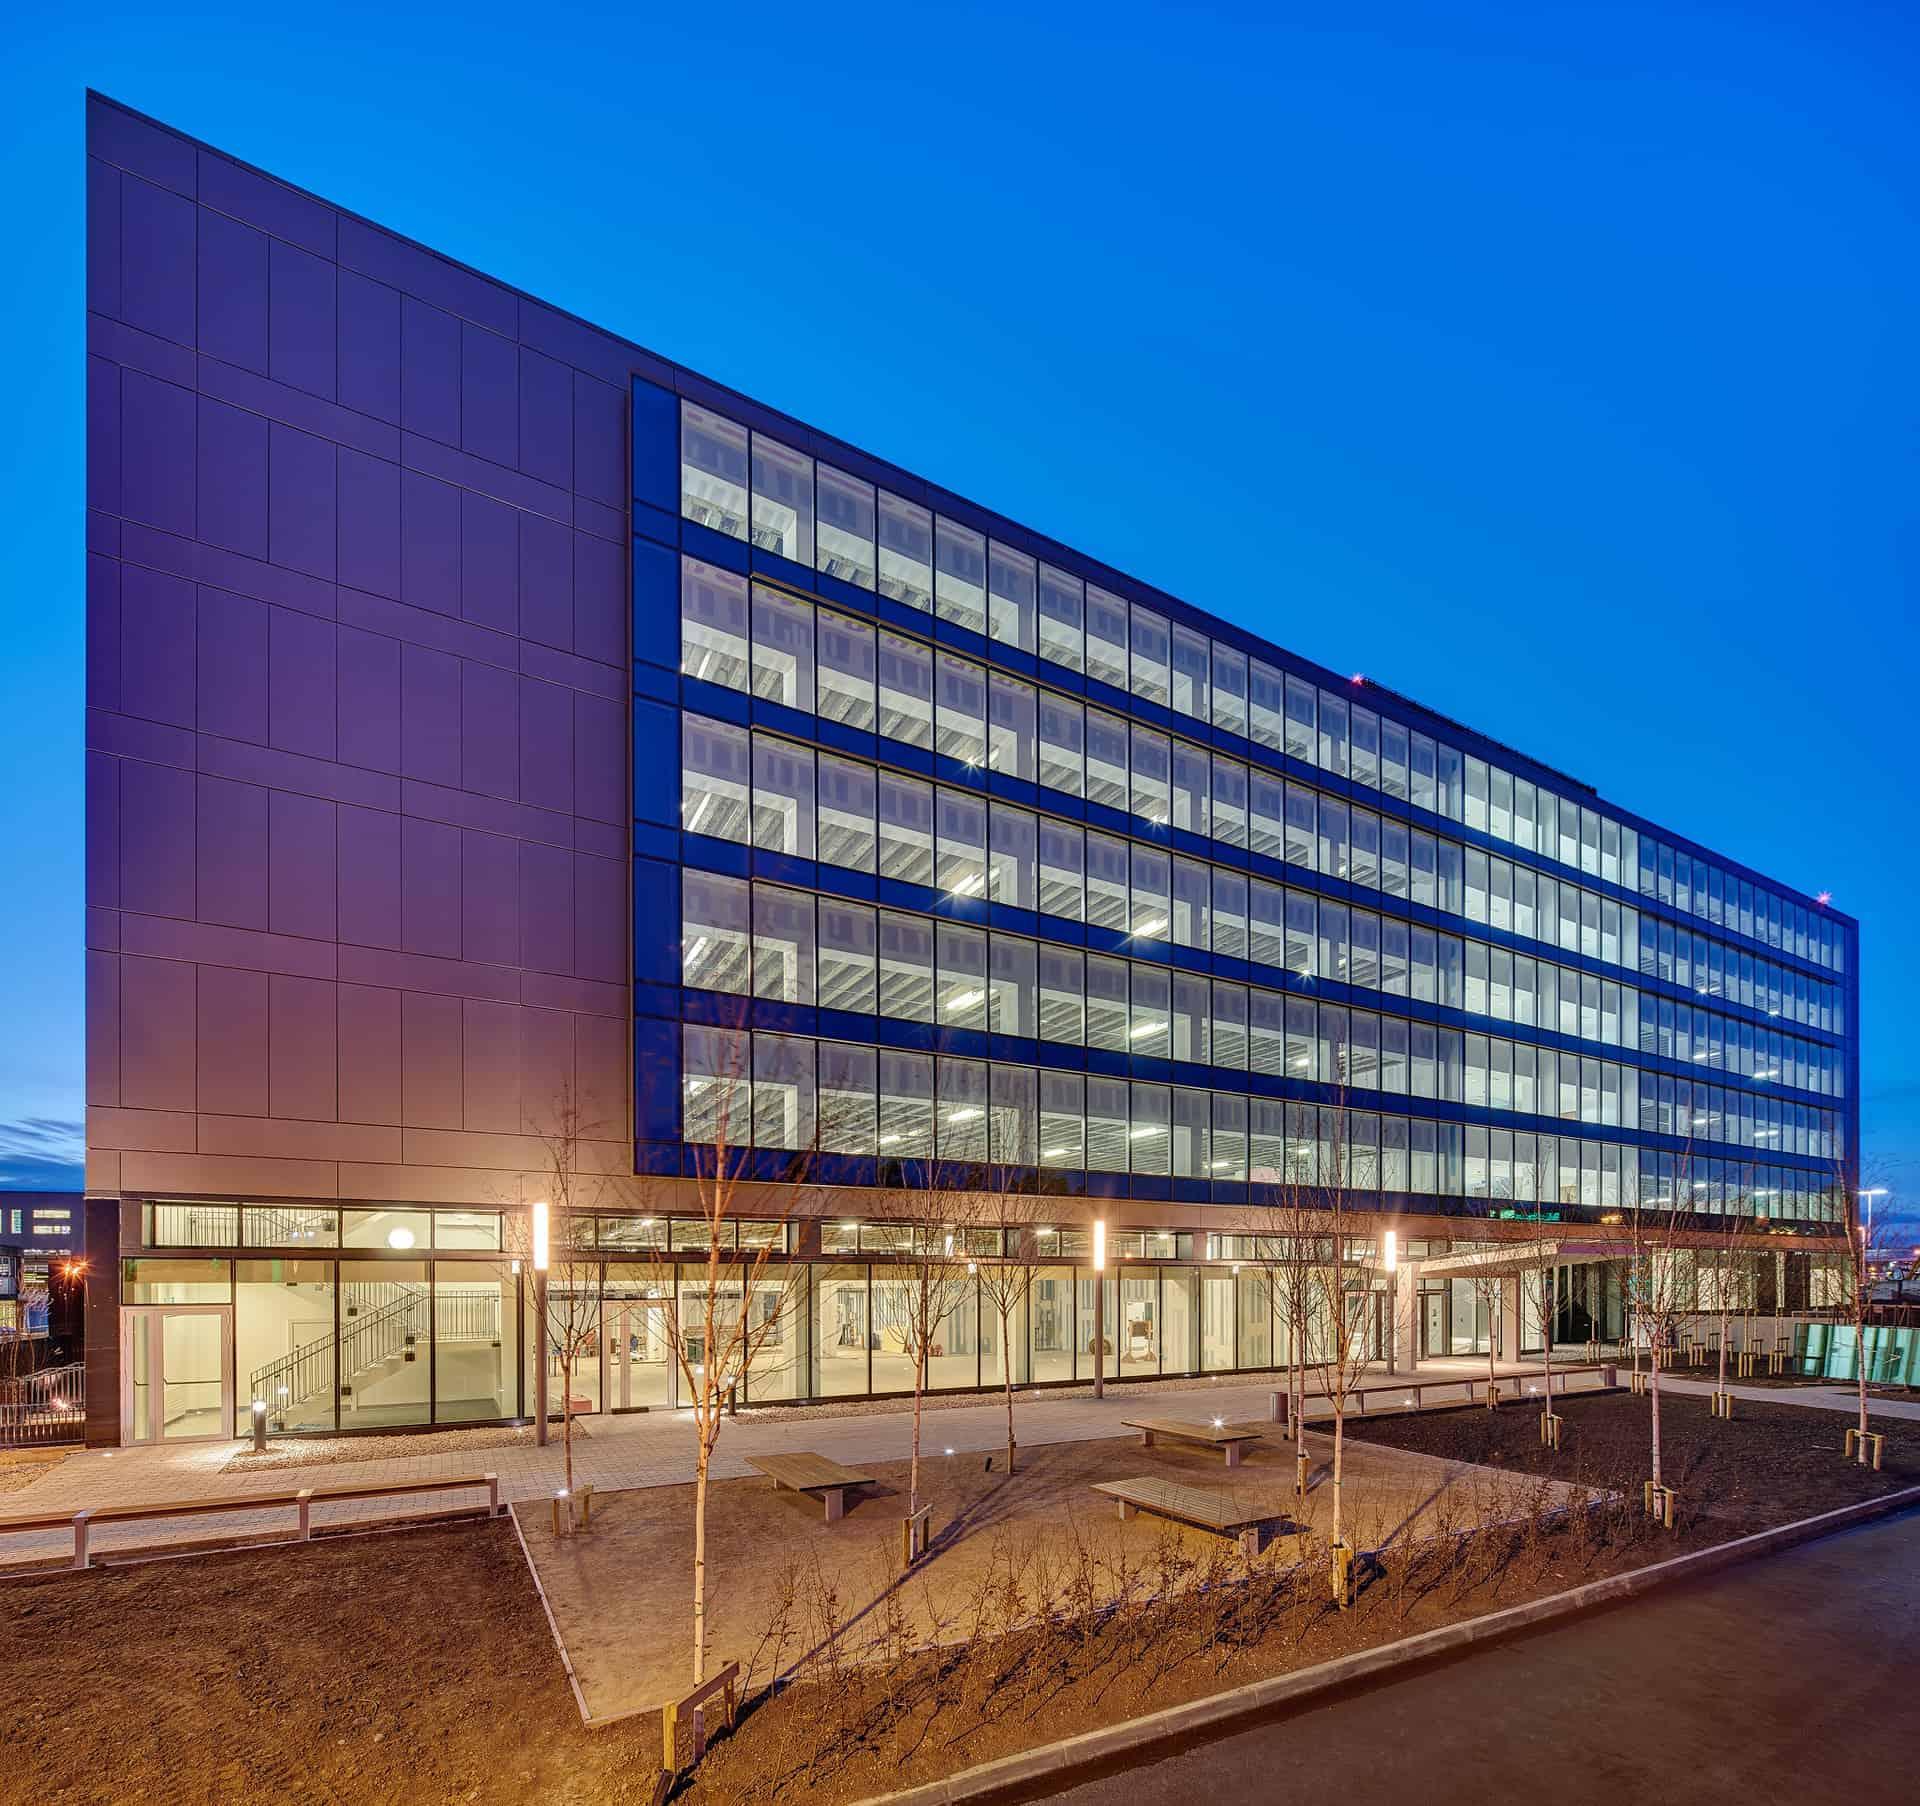 DAA-Building-2015-03-31-_DSC9952